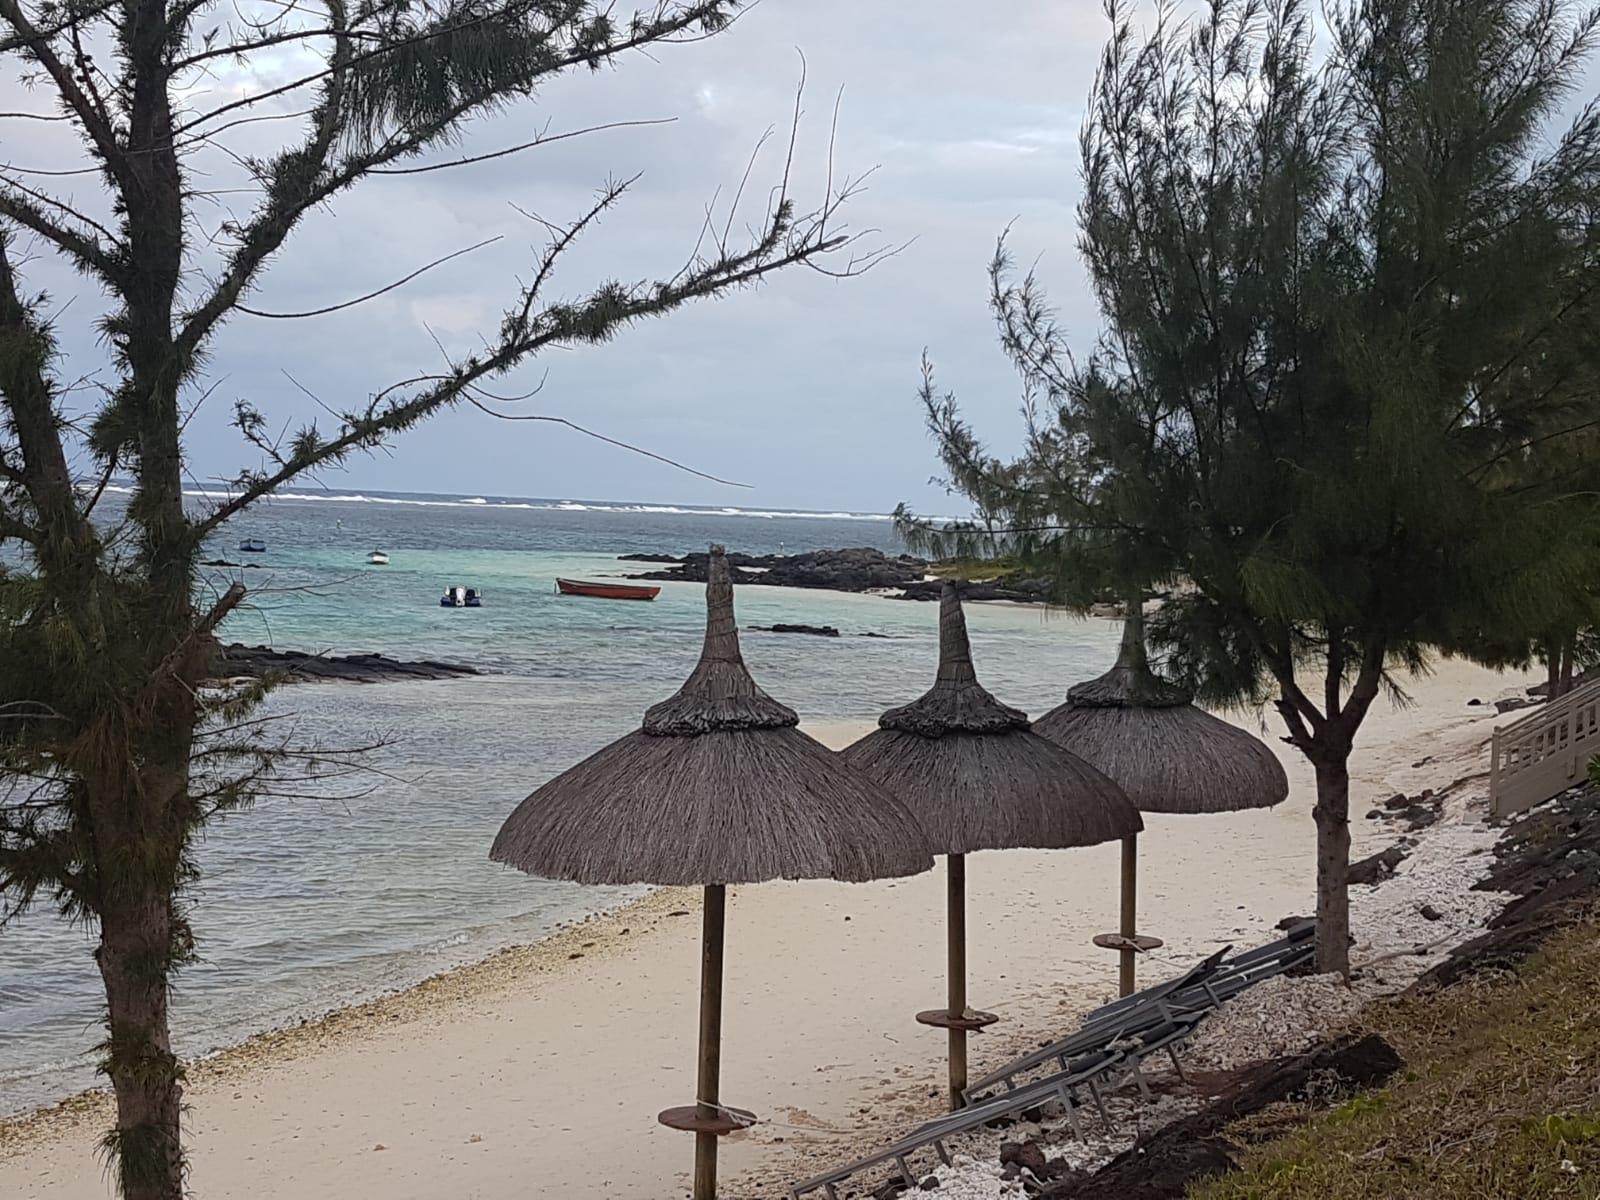 Solana Beach